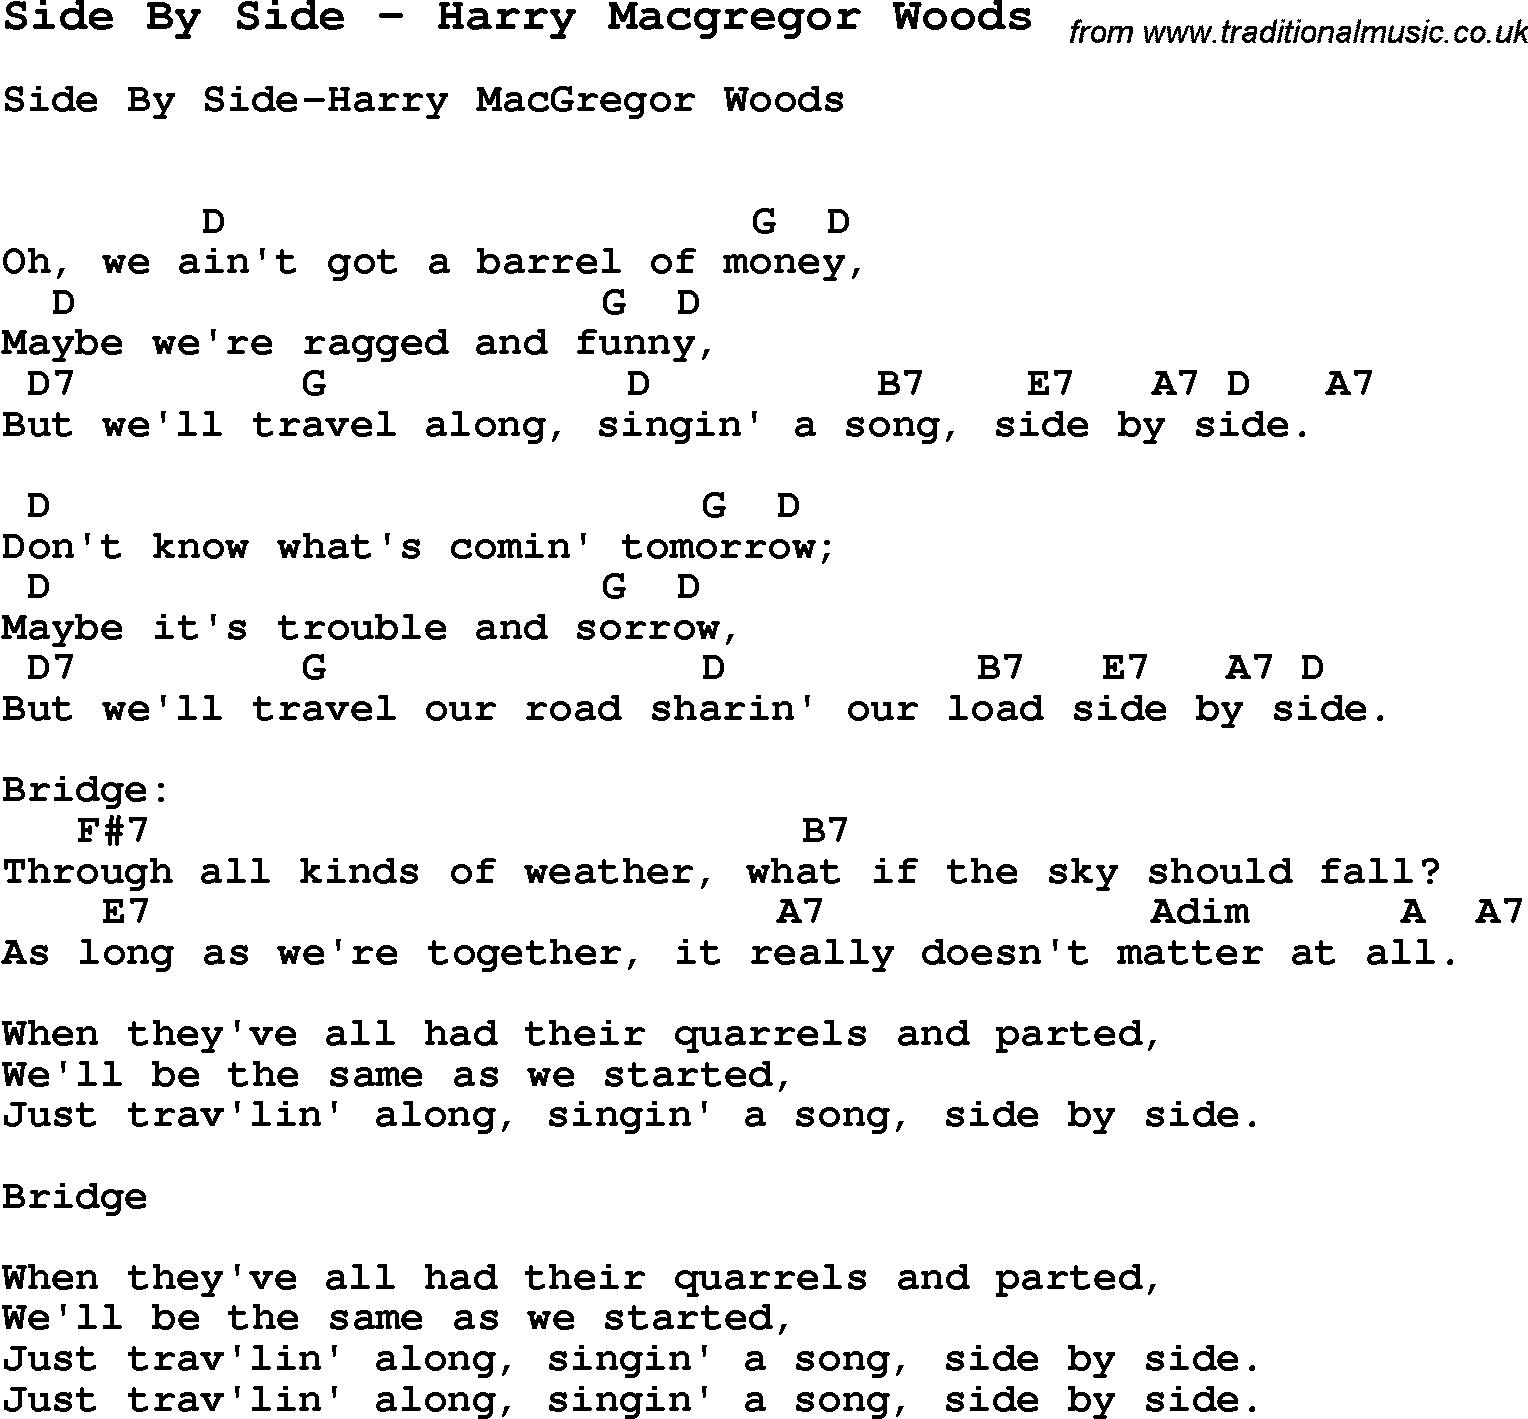 Side To Side Chords Song Side Side Harry Macgregor Woods Song Lyric For Vocal